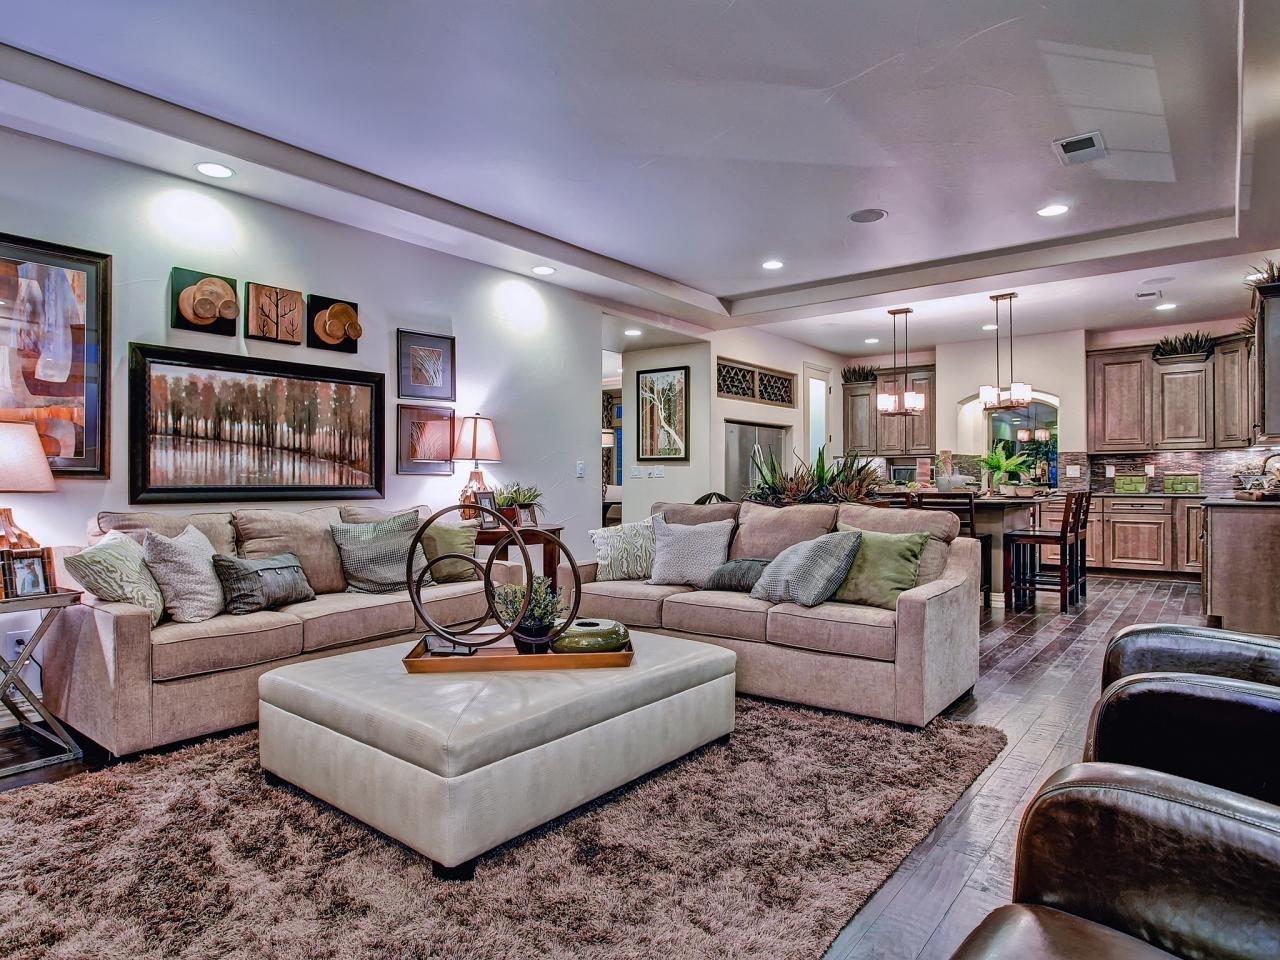 10 Elegant Large Living Room Design Ideas %name 2021